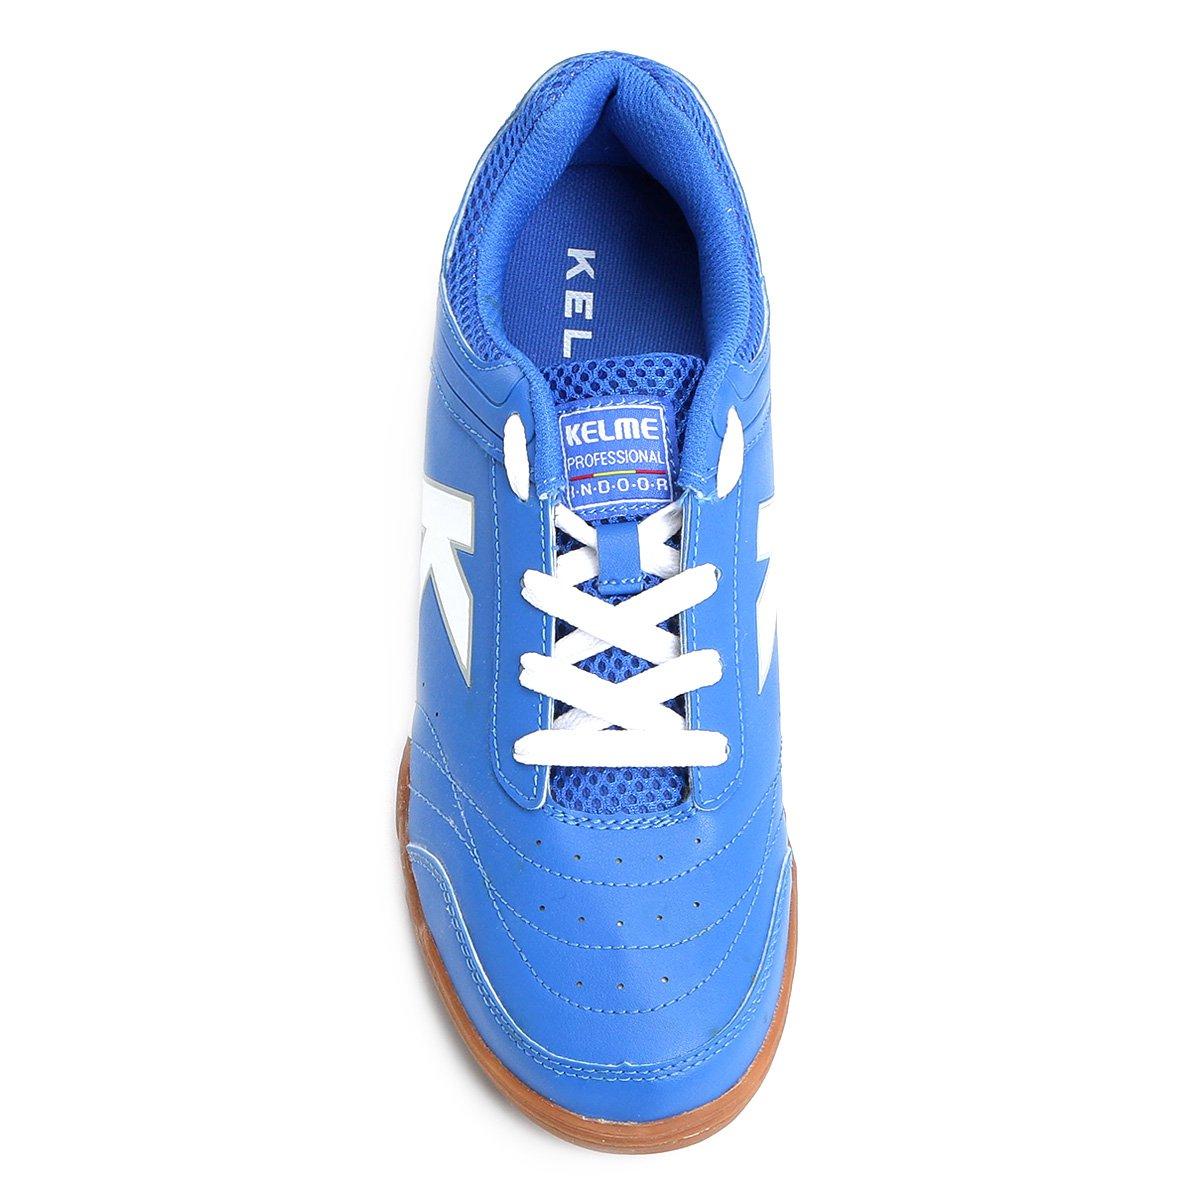 ... Branco Masculina Chuteira Kelme Precision Azul e Trn Chuteira Futsal  Futsal YqxzFz 2bf7765c5bb6d